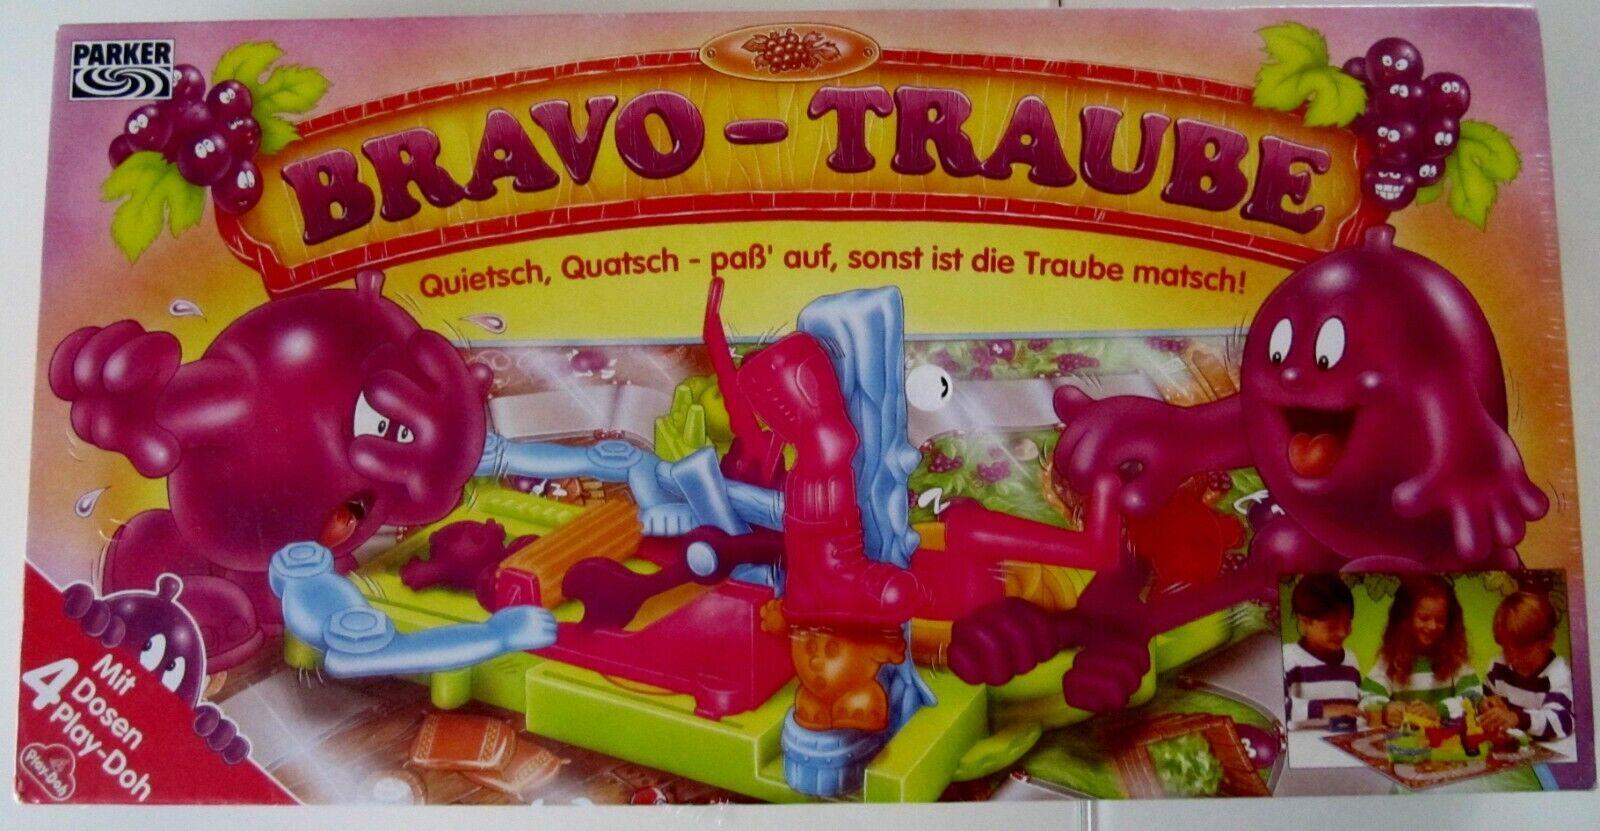 Ingénieux, Car-Neuf & neuf dans sa Boîte  Bravo-Raisin  vraiment dans feuille  neuf dans sa boîte légèrement Cognée